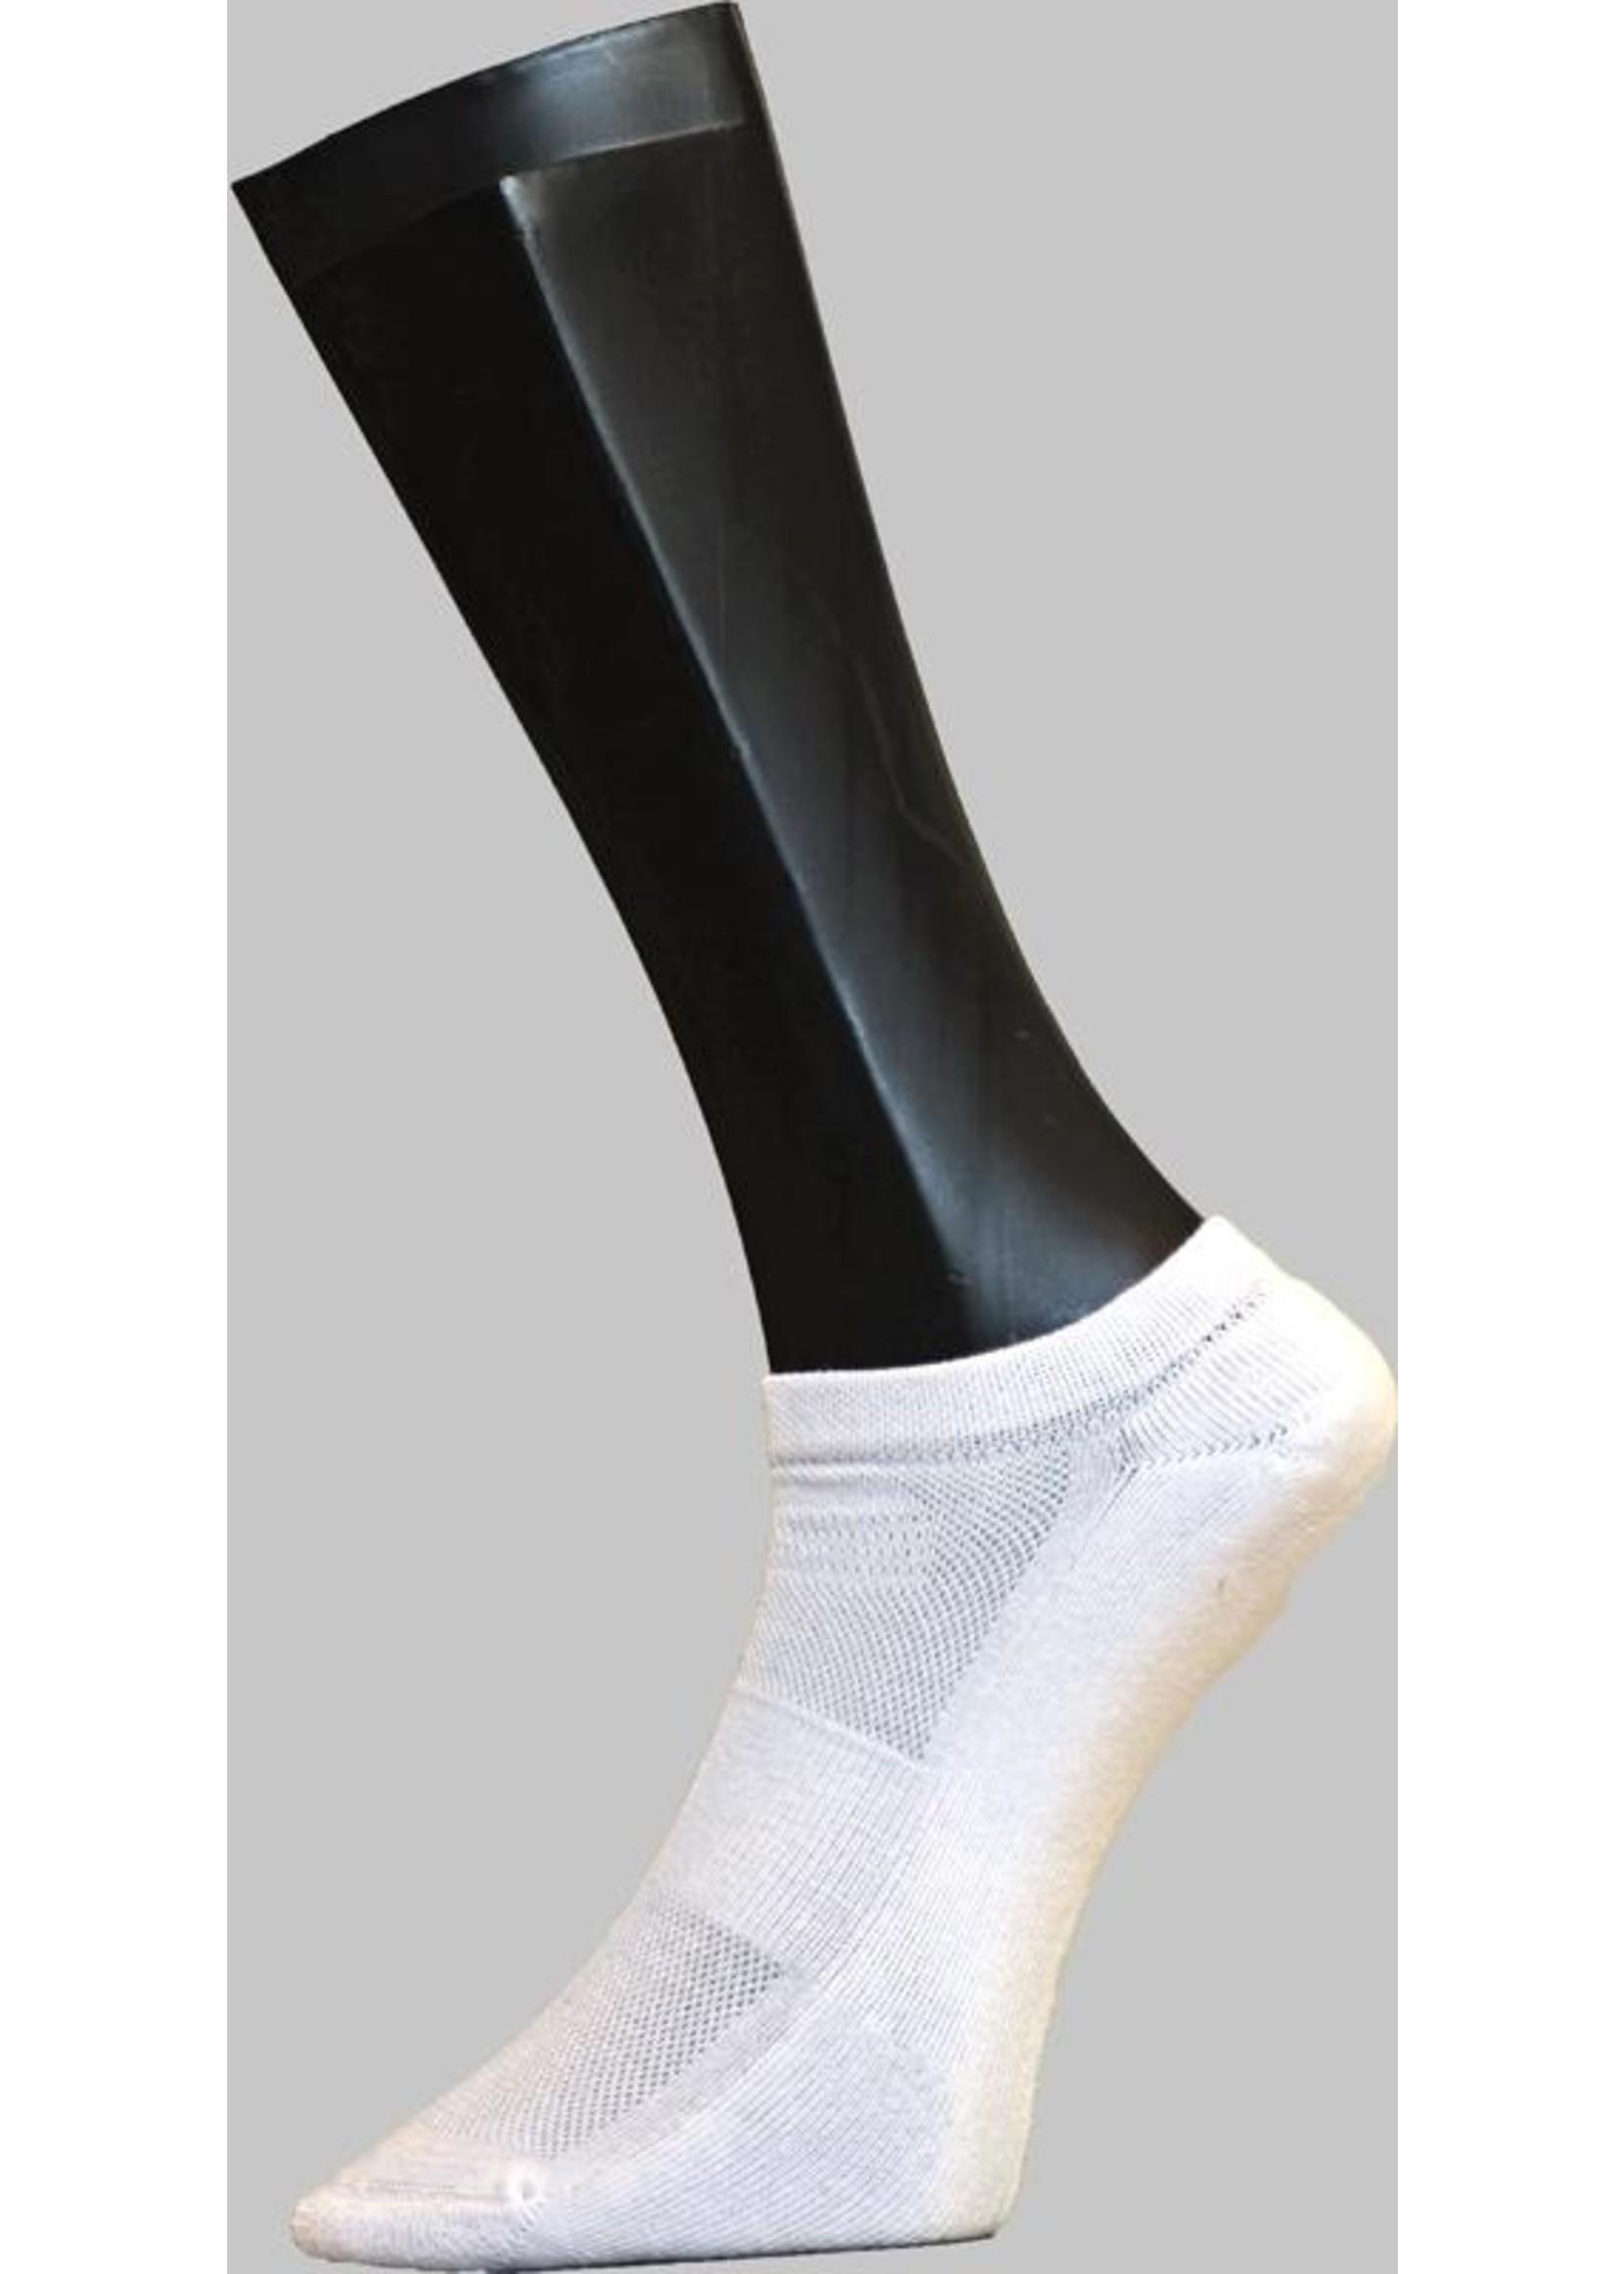 Sneaker badstofzool - Wit (2 paar)